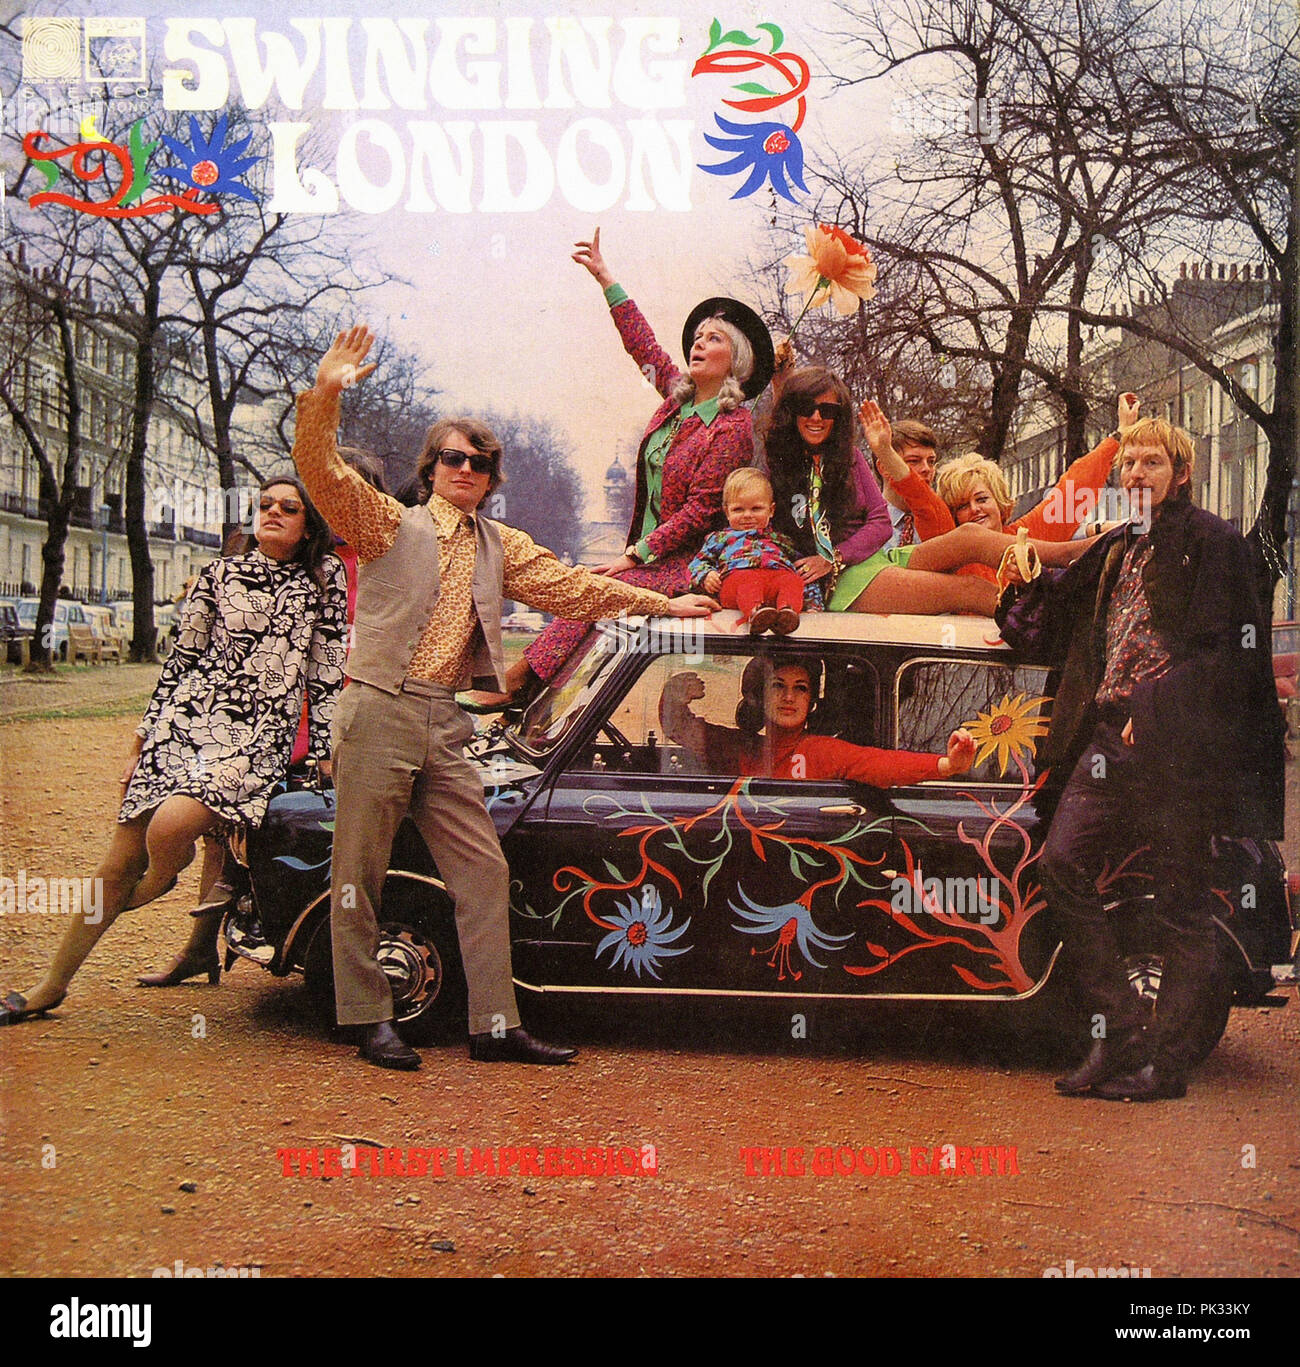 vintage vinyl record album - Swinging London  1968 - Stock Image